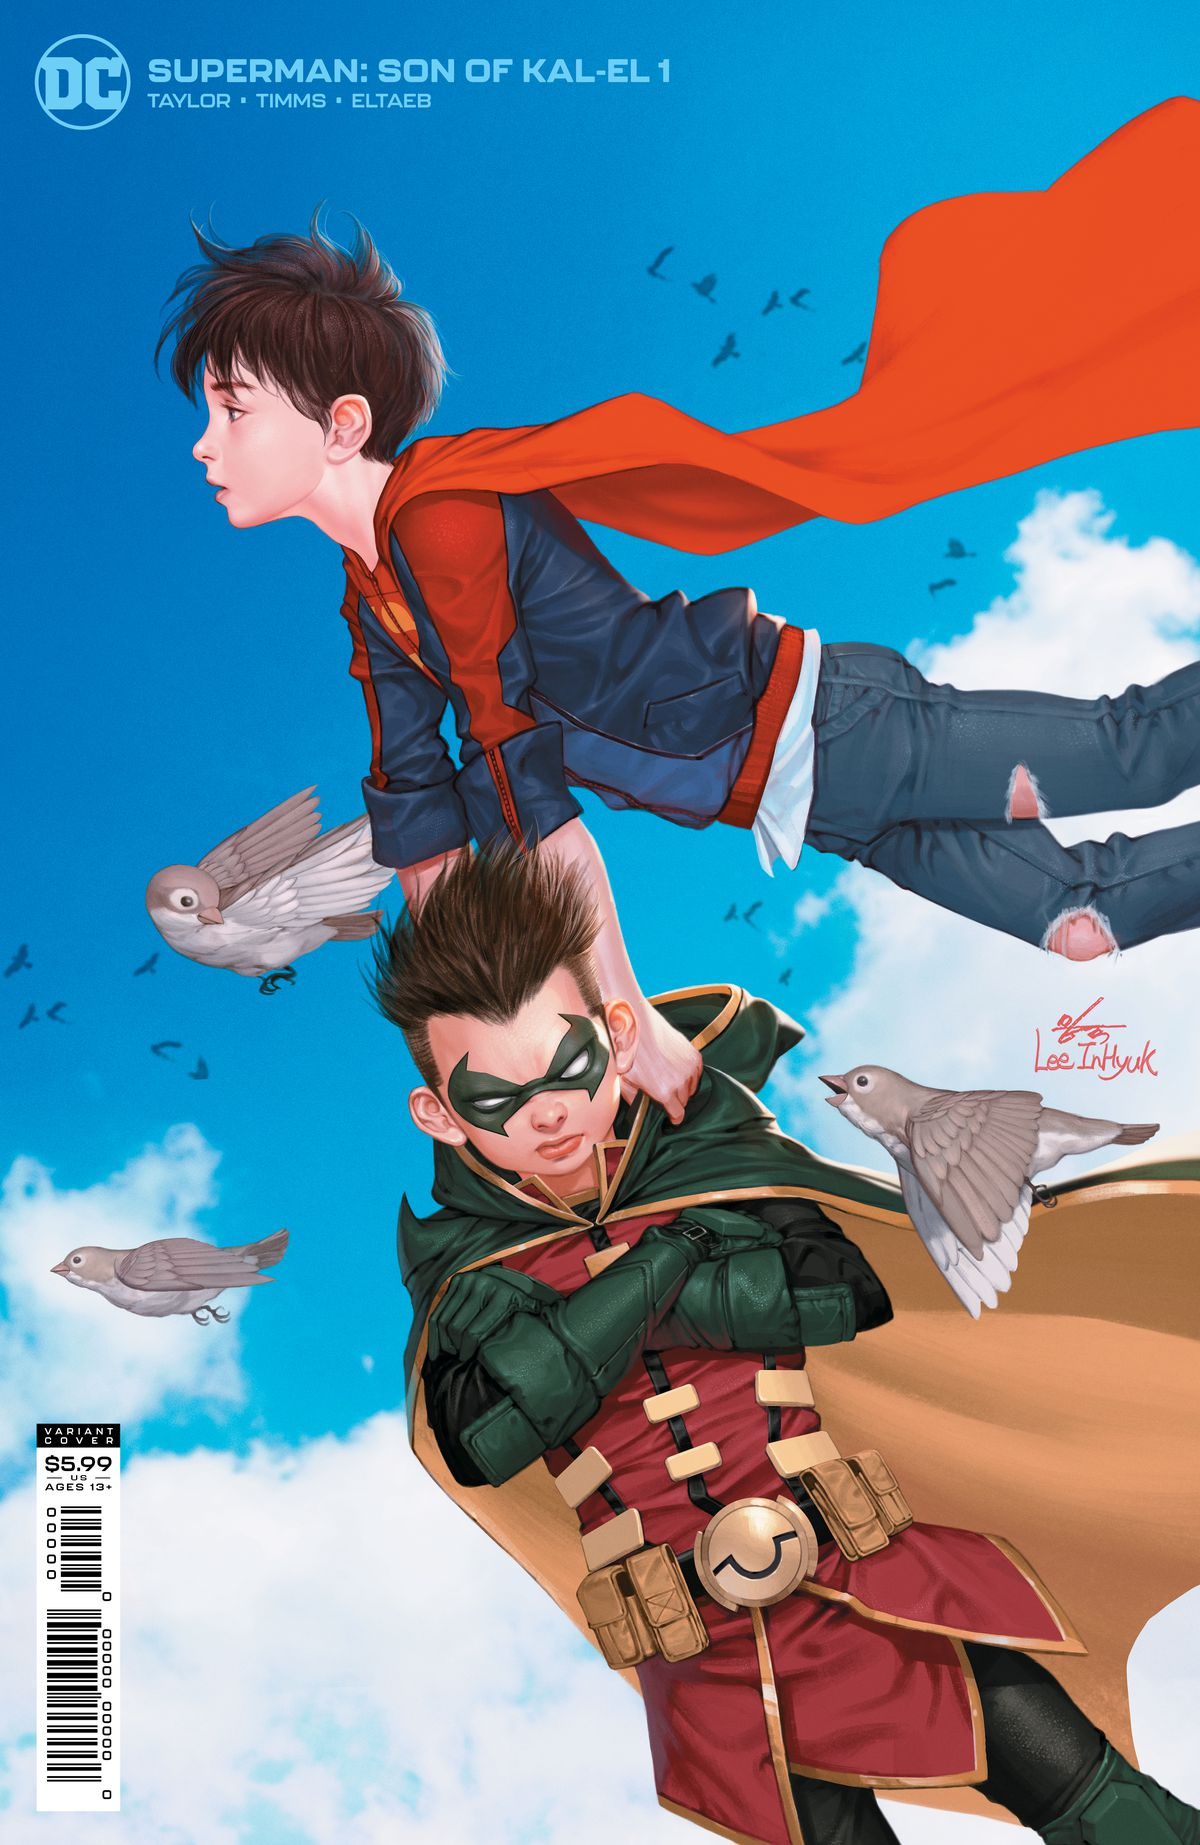 Jon Kent/Superbow carries a grumpy Damian Wayne/Robin through the sky on the cover of Superman: Son of Kal-El #1, DC Comics (2021).